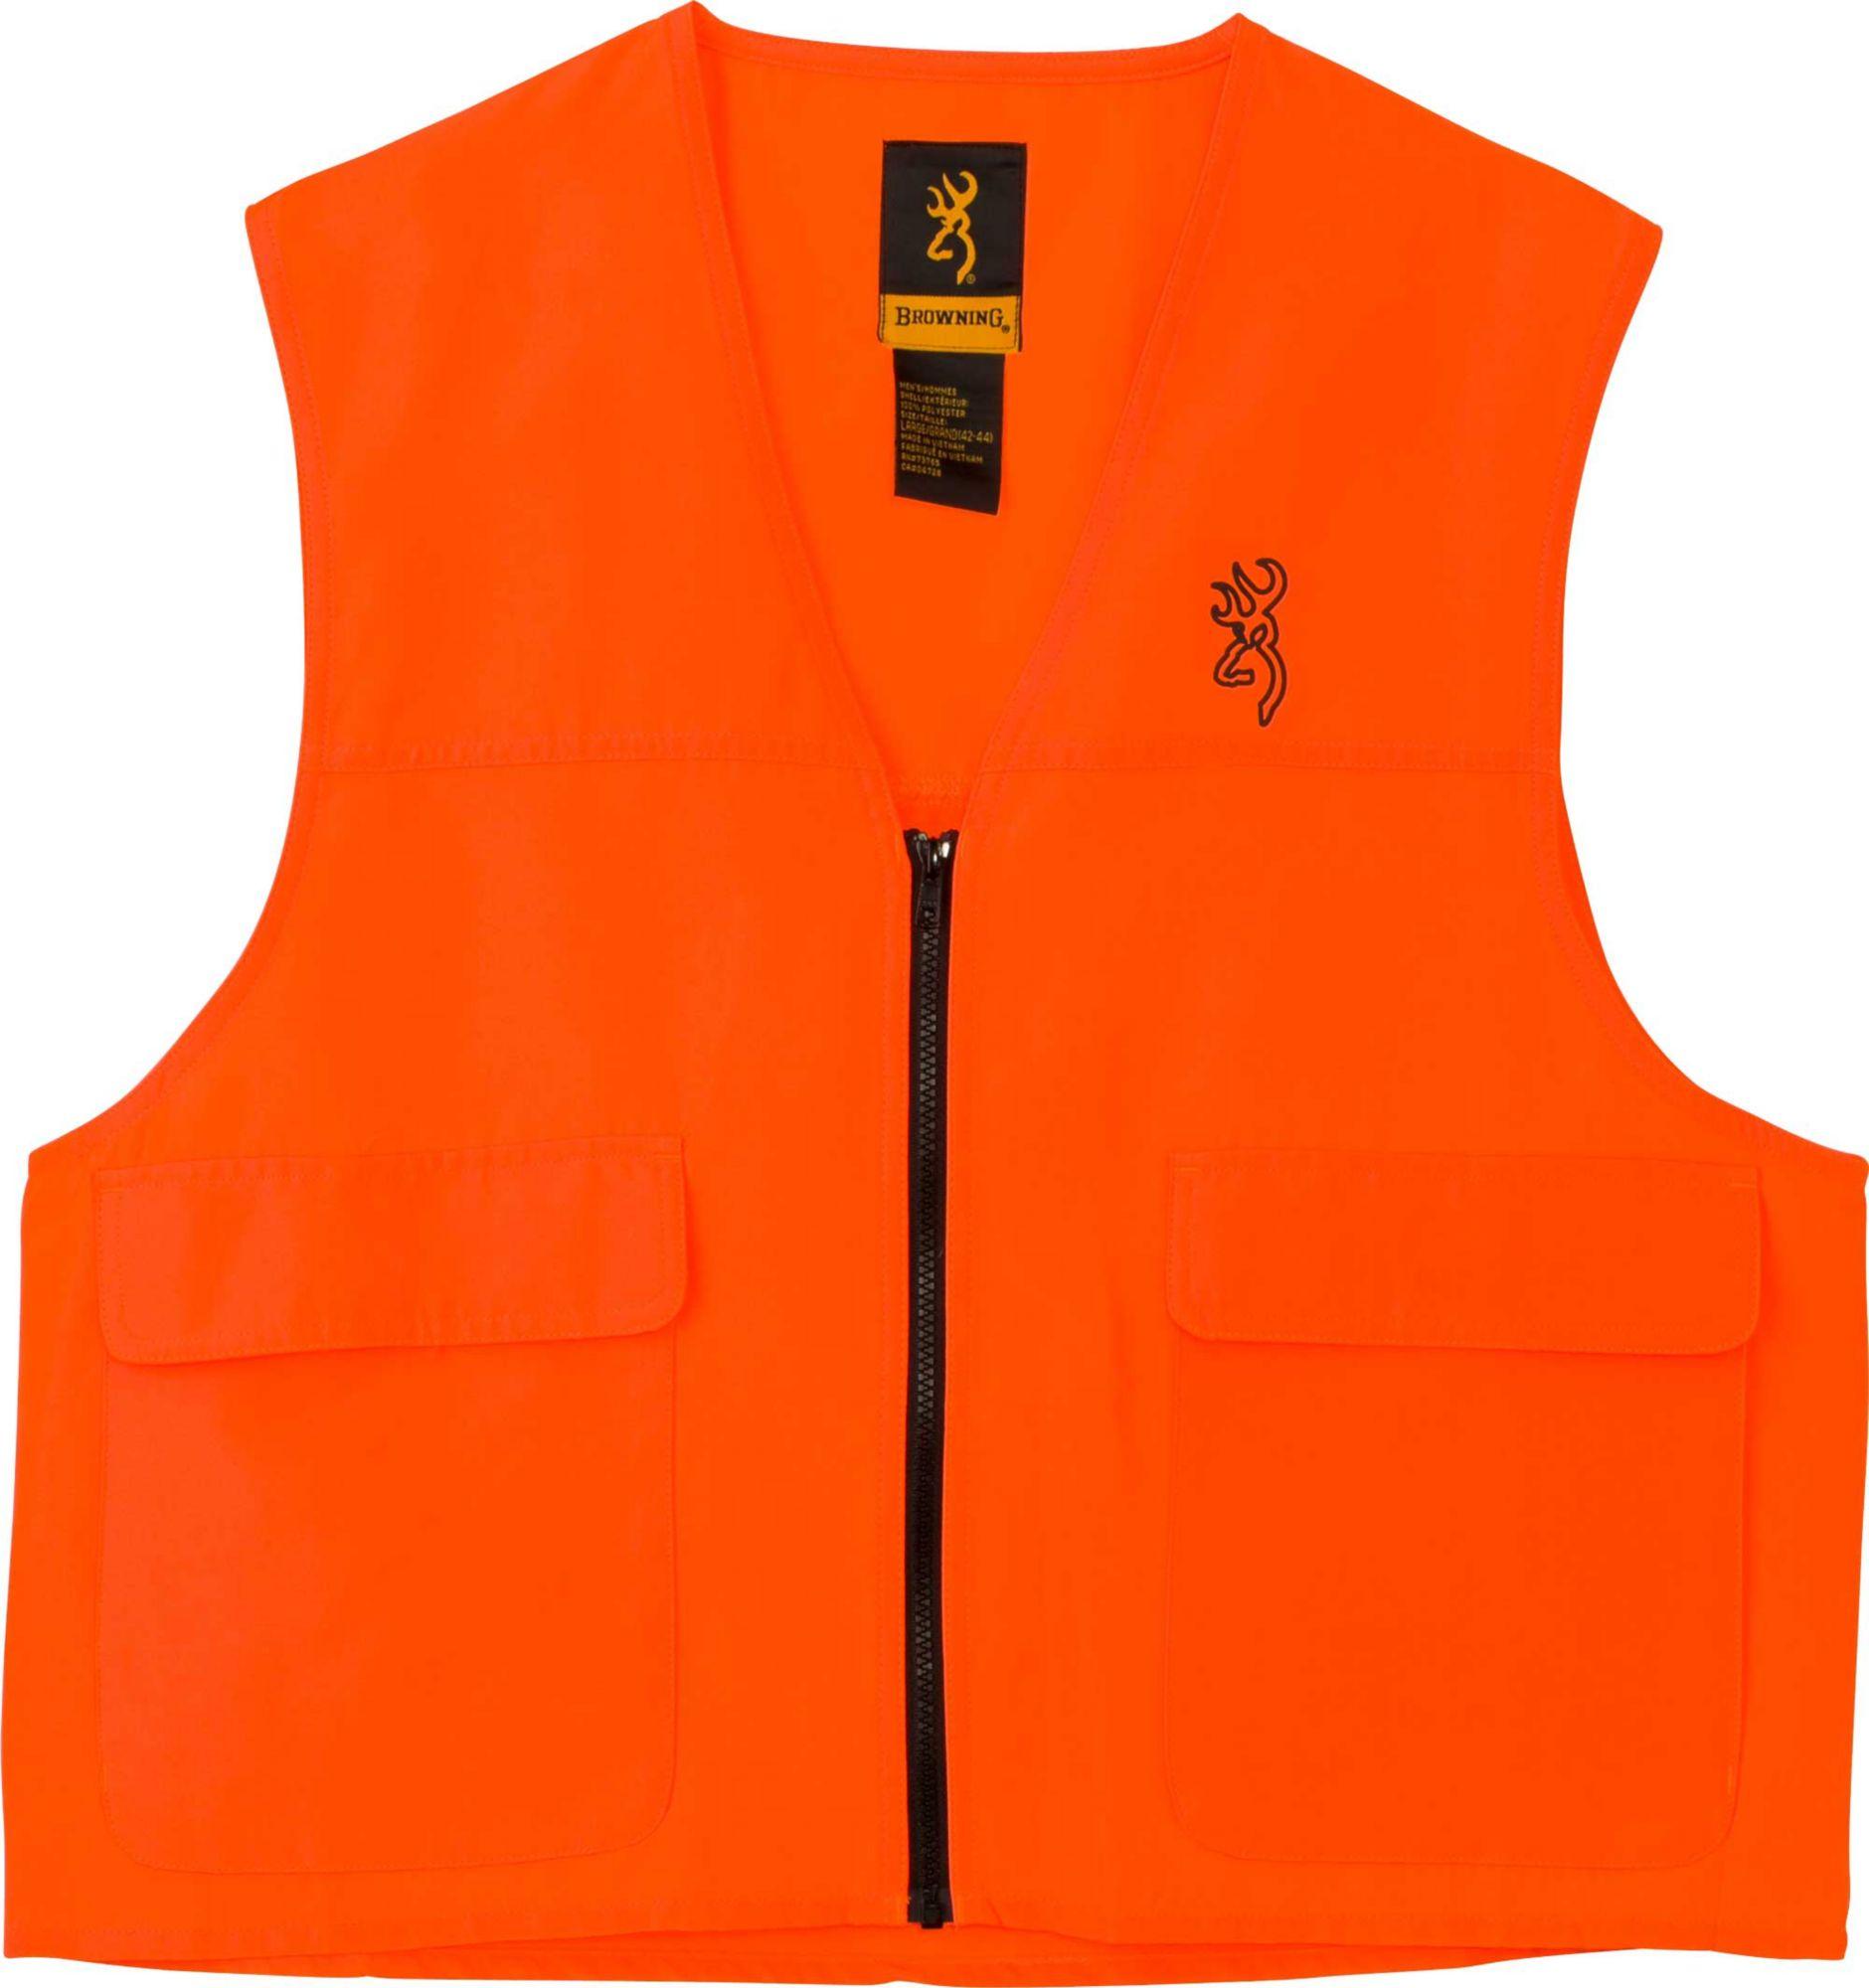 Browning Safety Blaze Hunting Vest, Men's, Size: Medium, Blaze Orange thumbnail